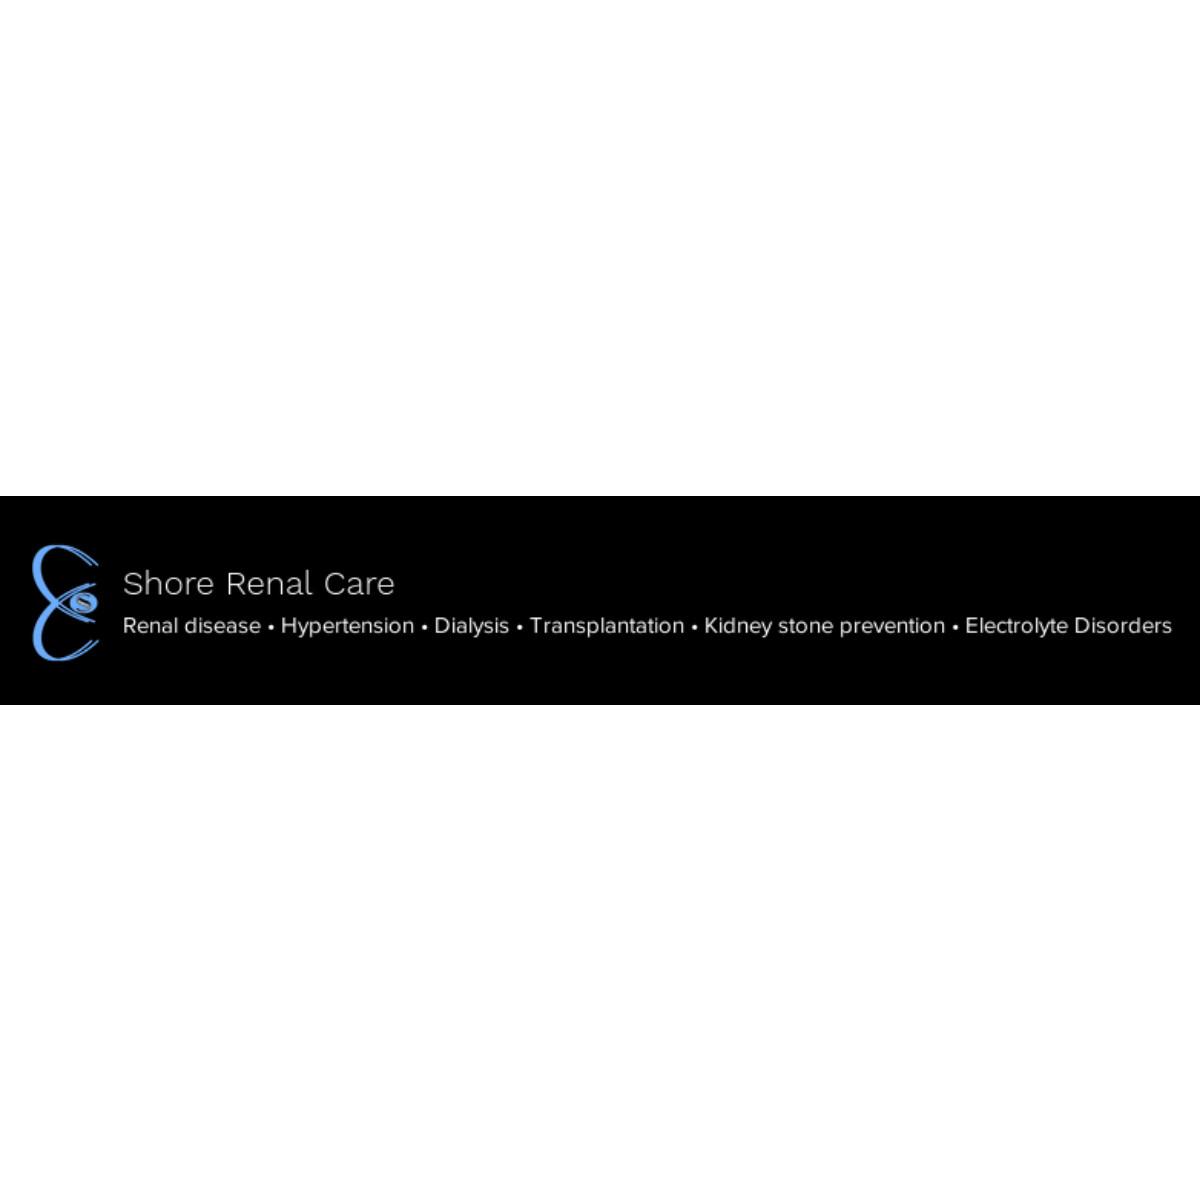 Shore Renal Care